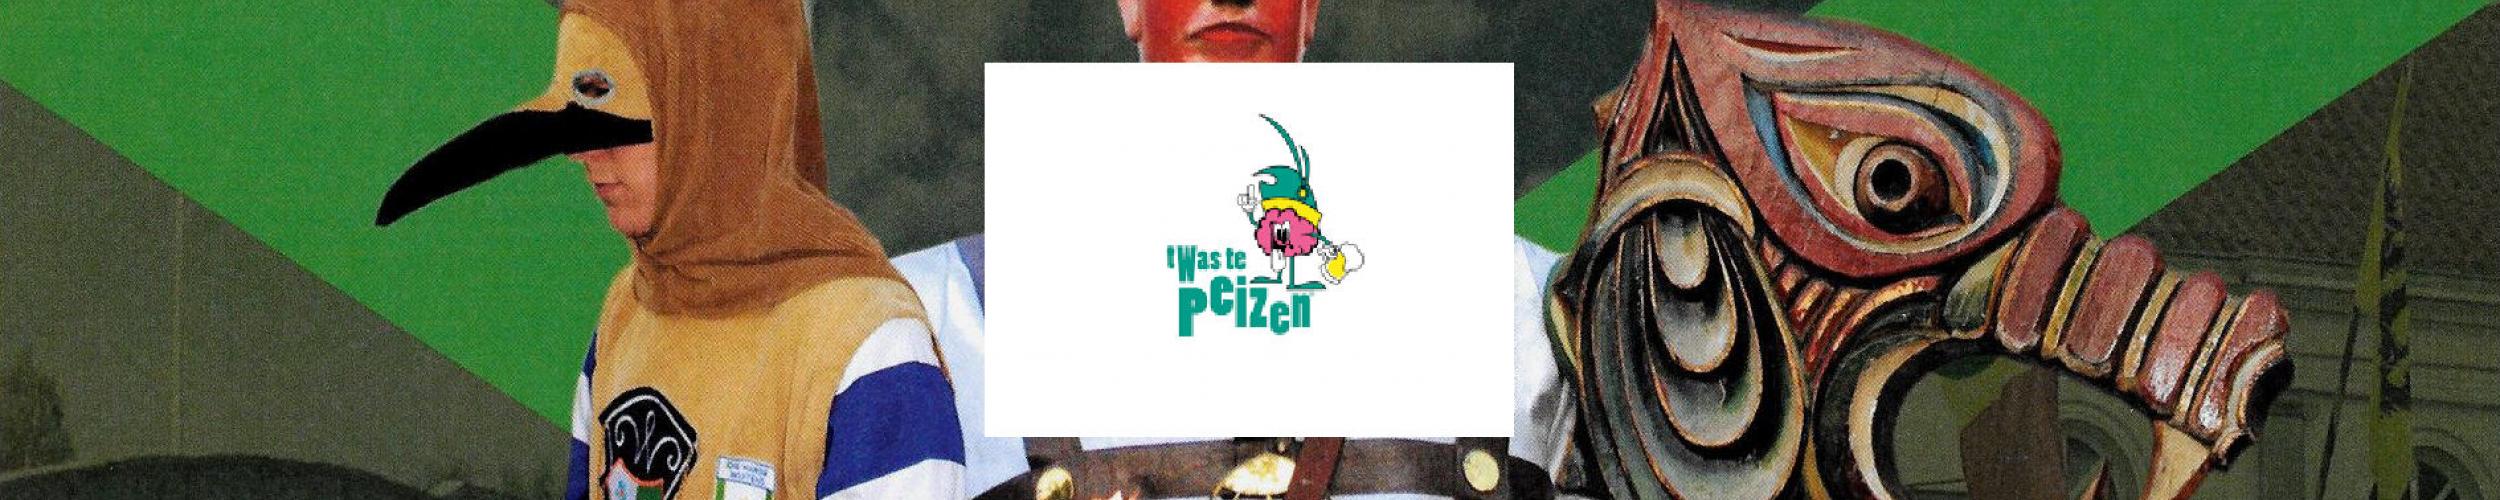 HKV 't was te Peizen